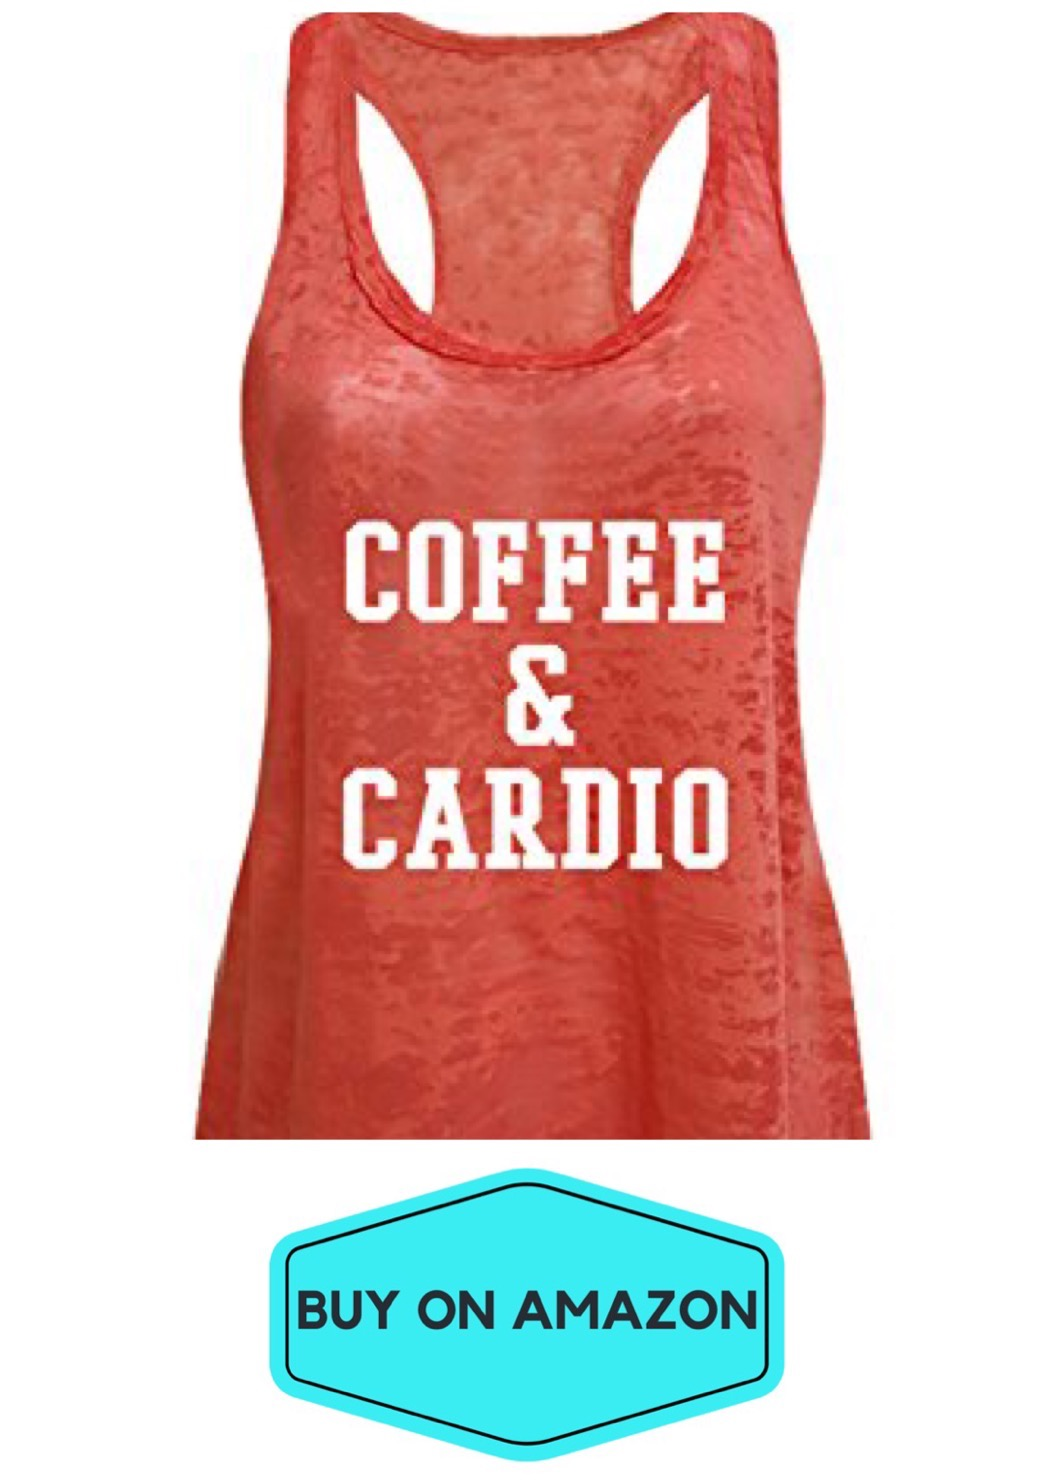 Coffee and Cardio Tank